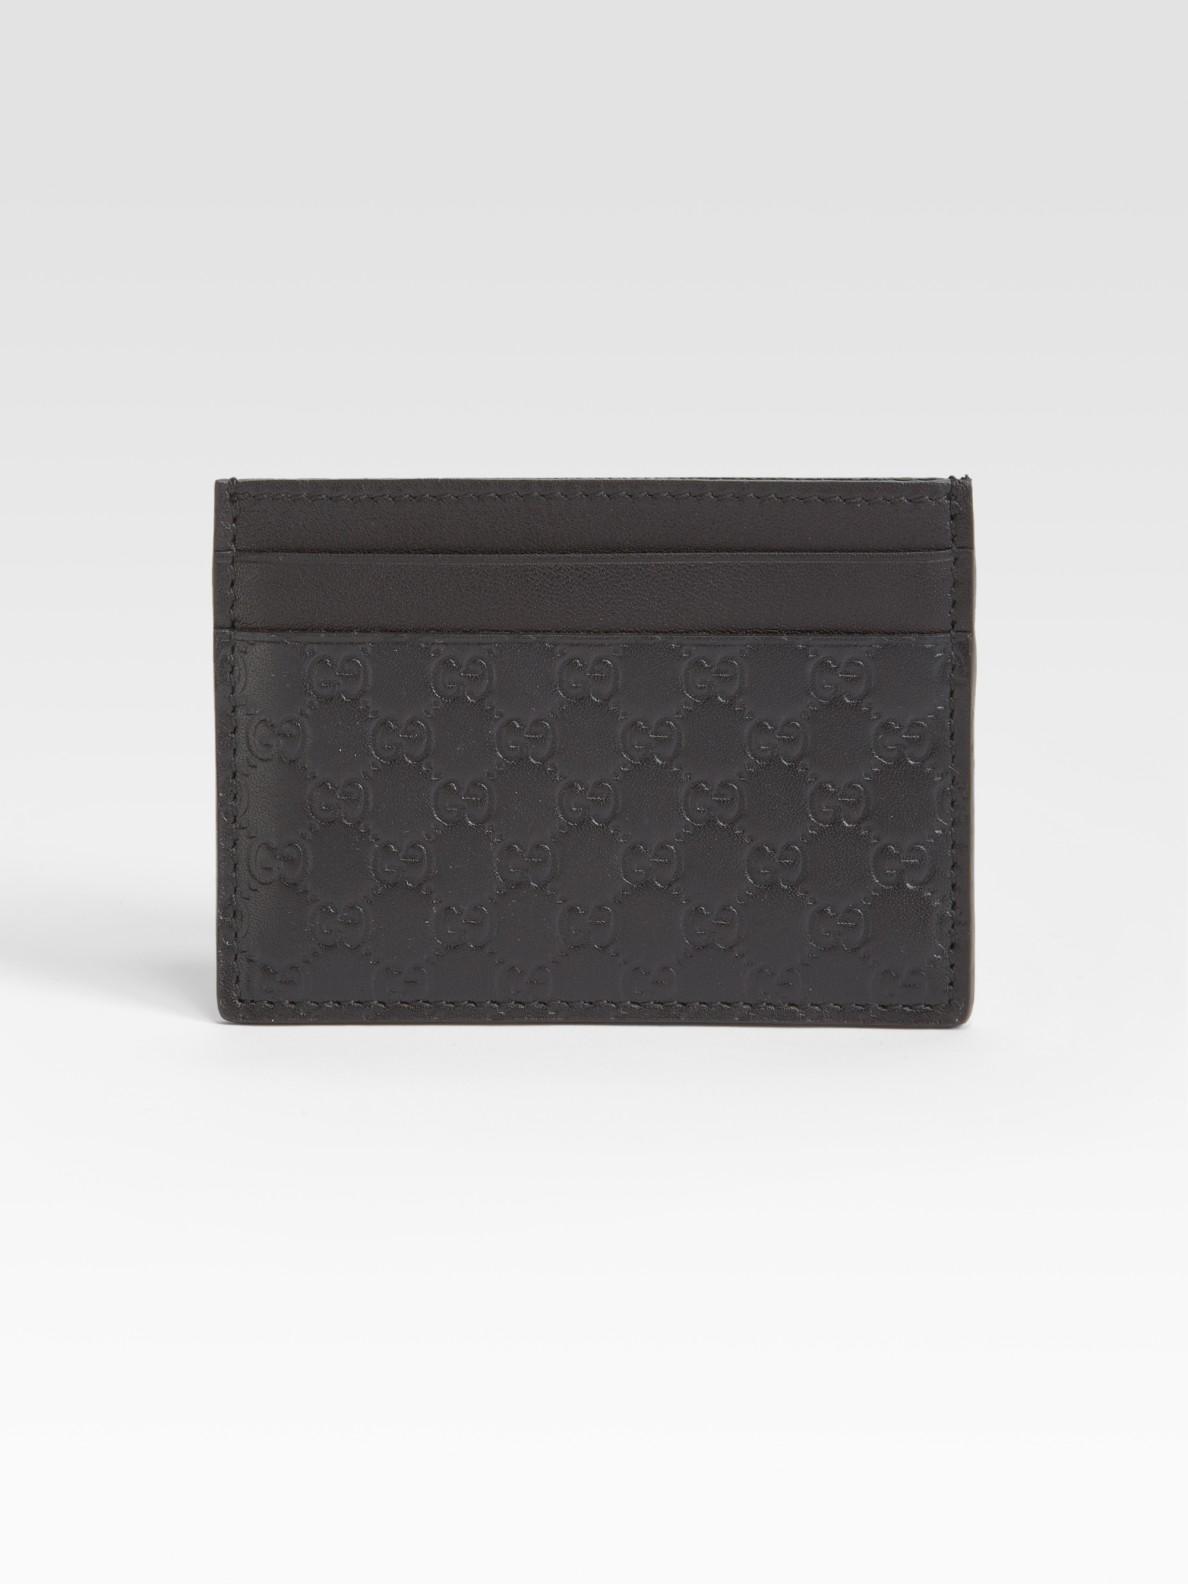 f182153c1973 Gucci Microguccissima Leather Card Case in Black for Men - Lyst